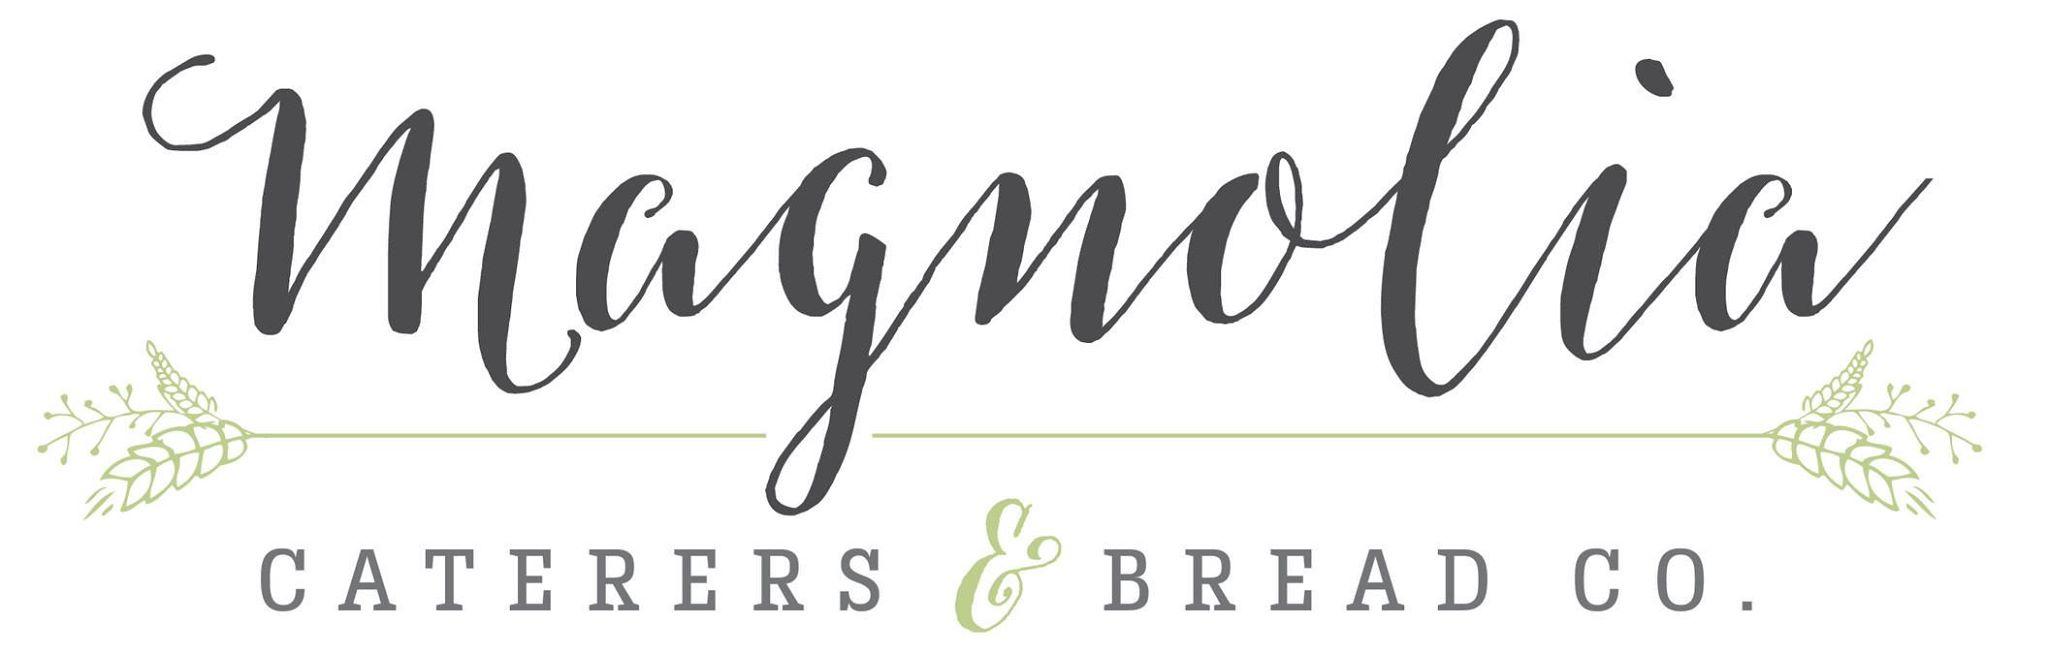 magnolia caterers logo